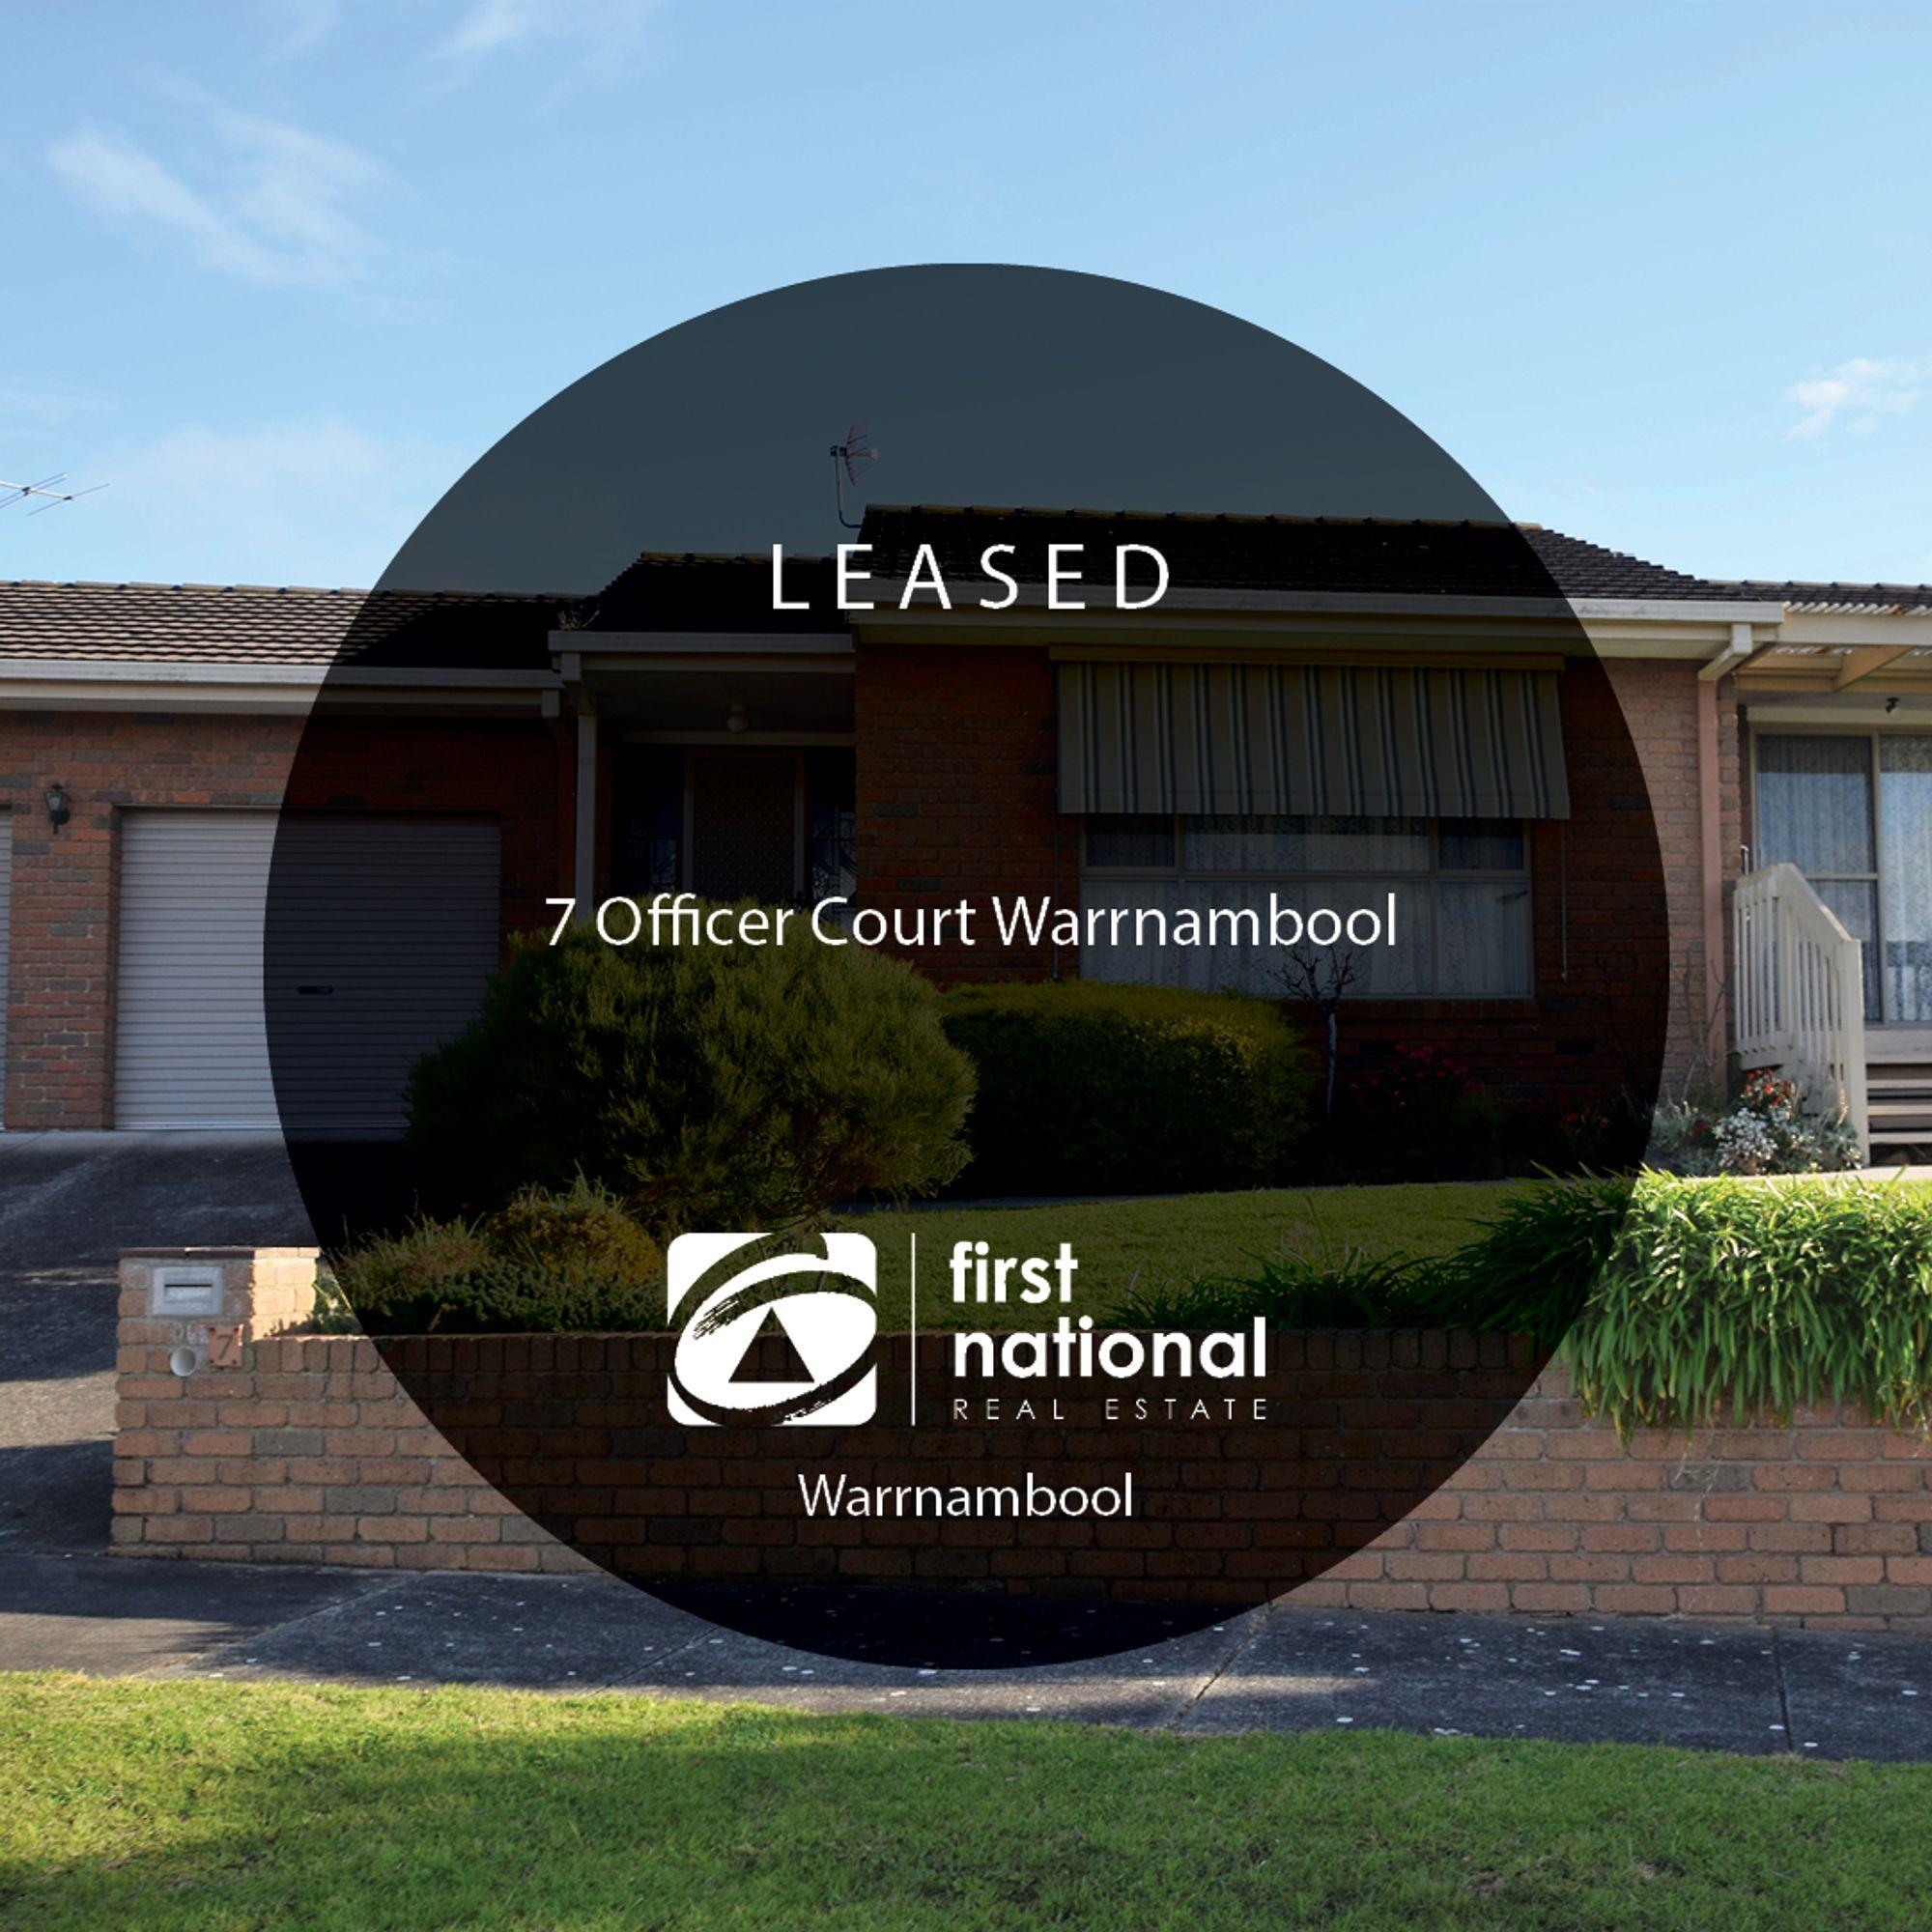 7 Officer Court, Warrnambool, VIC 3280